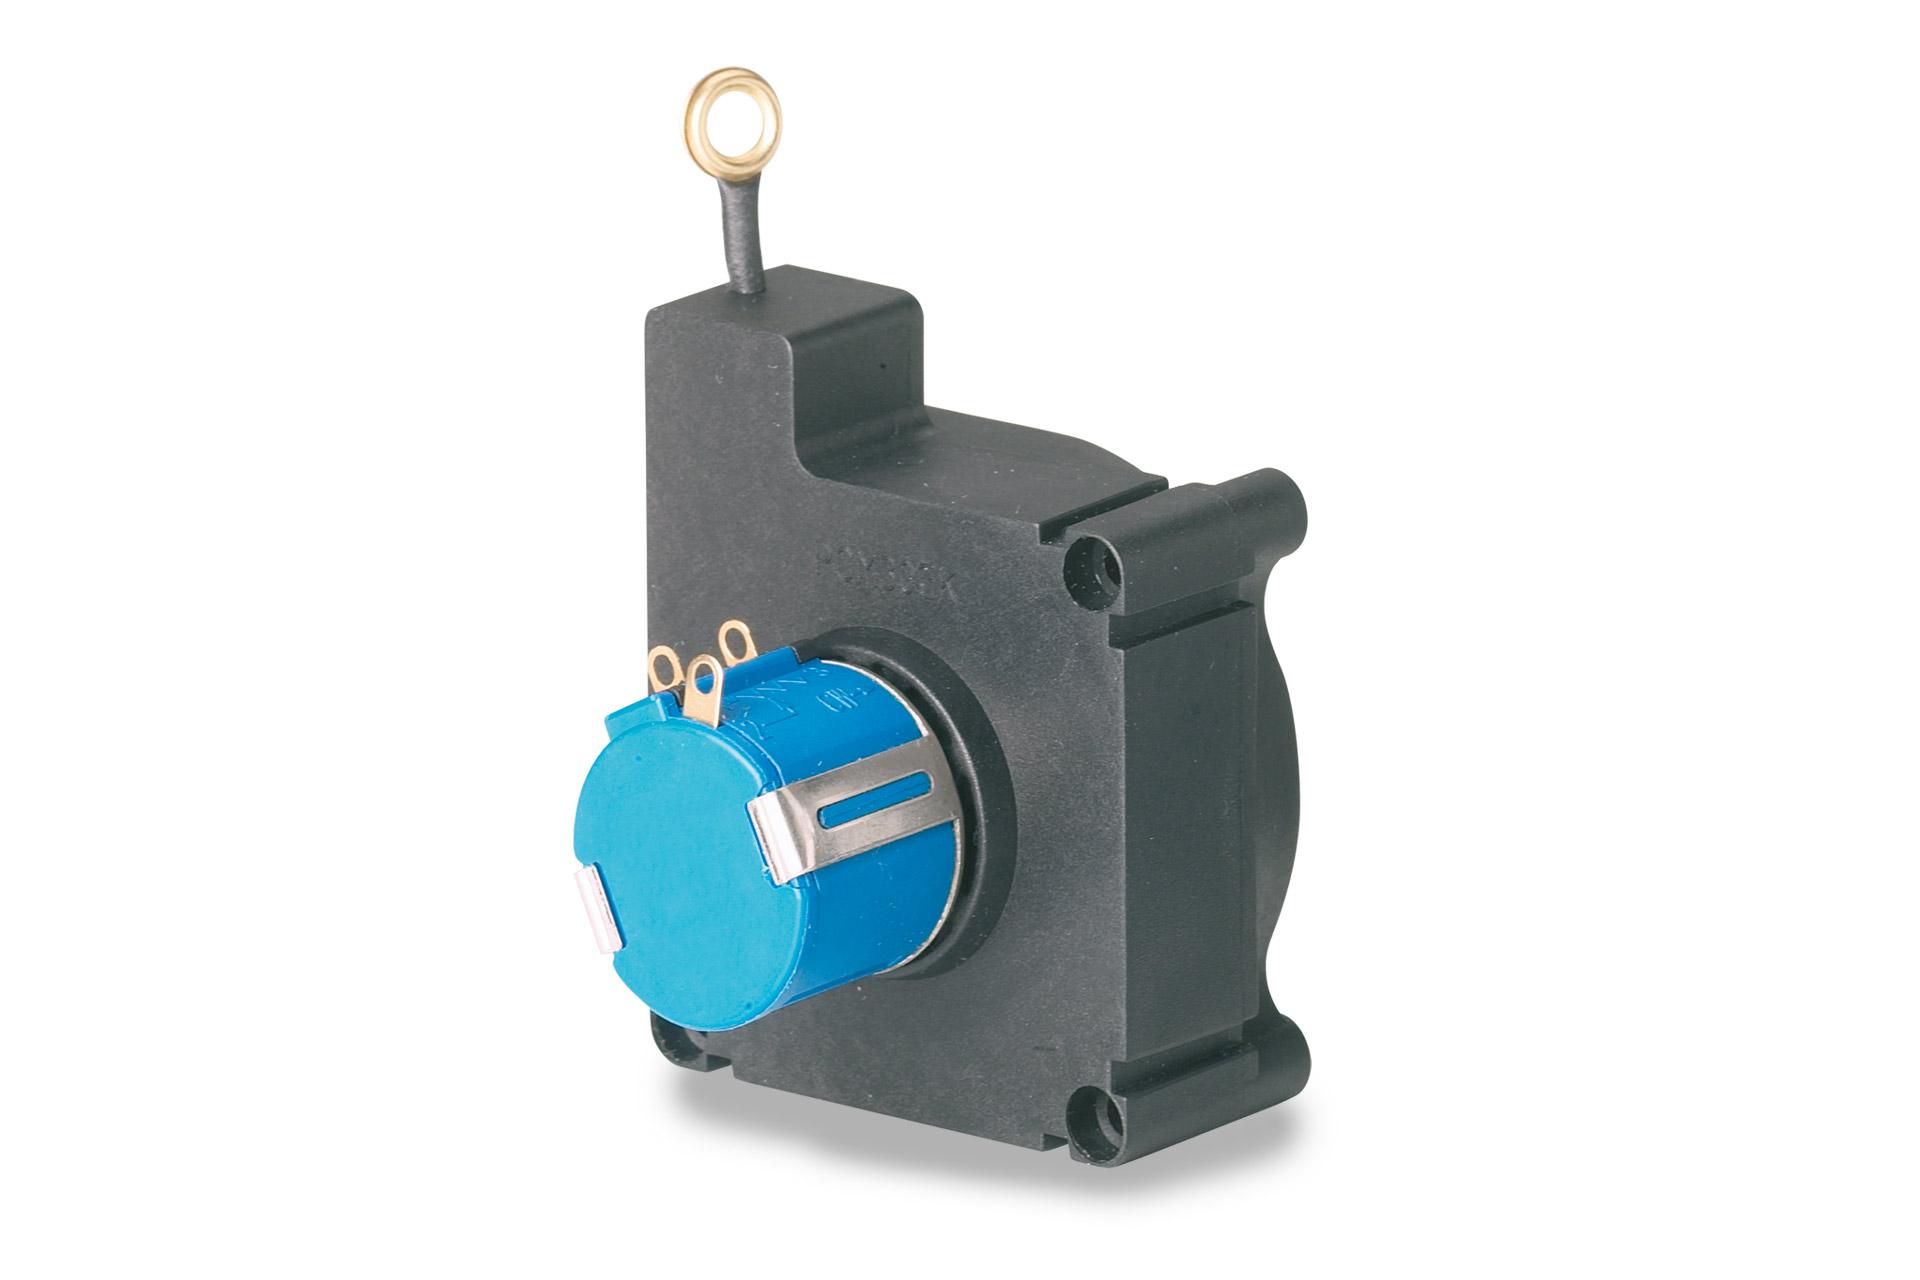 WPS-1250-MK46-P10 Miniatur-Seilzug-Wegsensor